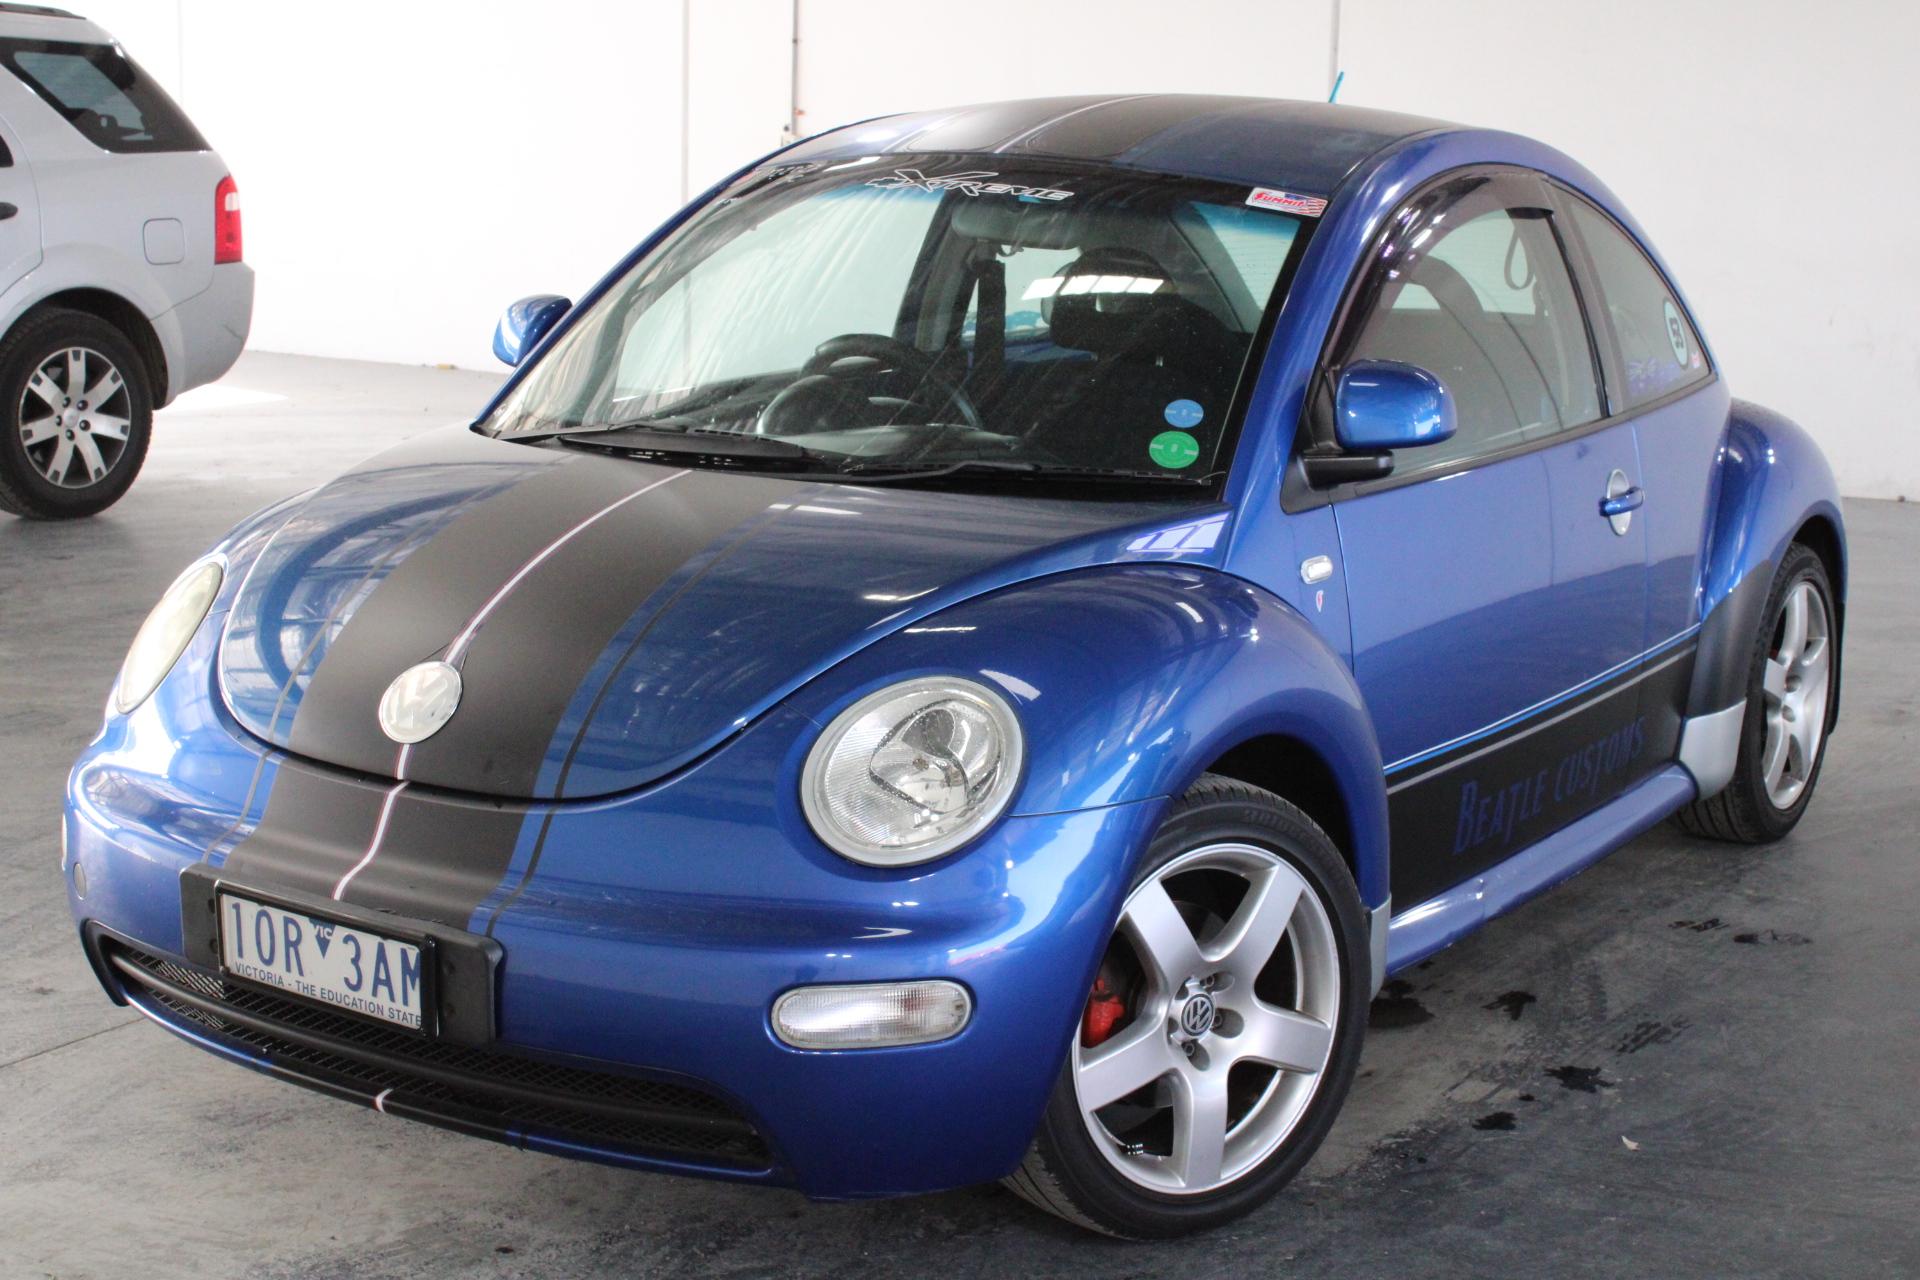 2003 Volkswagen Beetle 1.6 A4 Automatic Hatchback